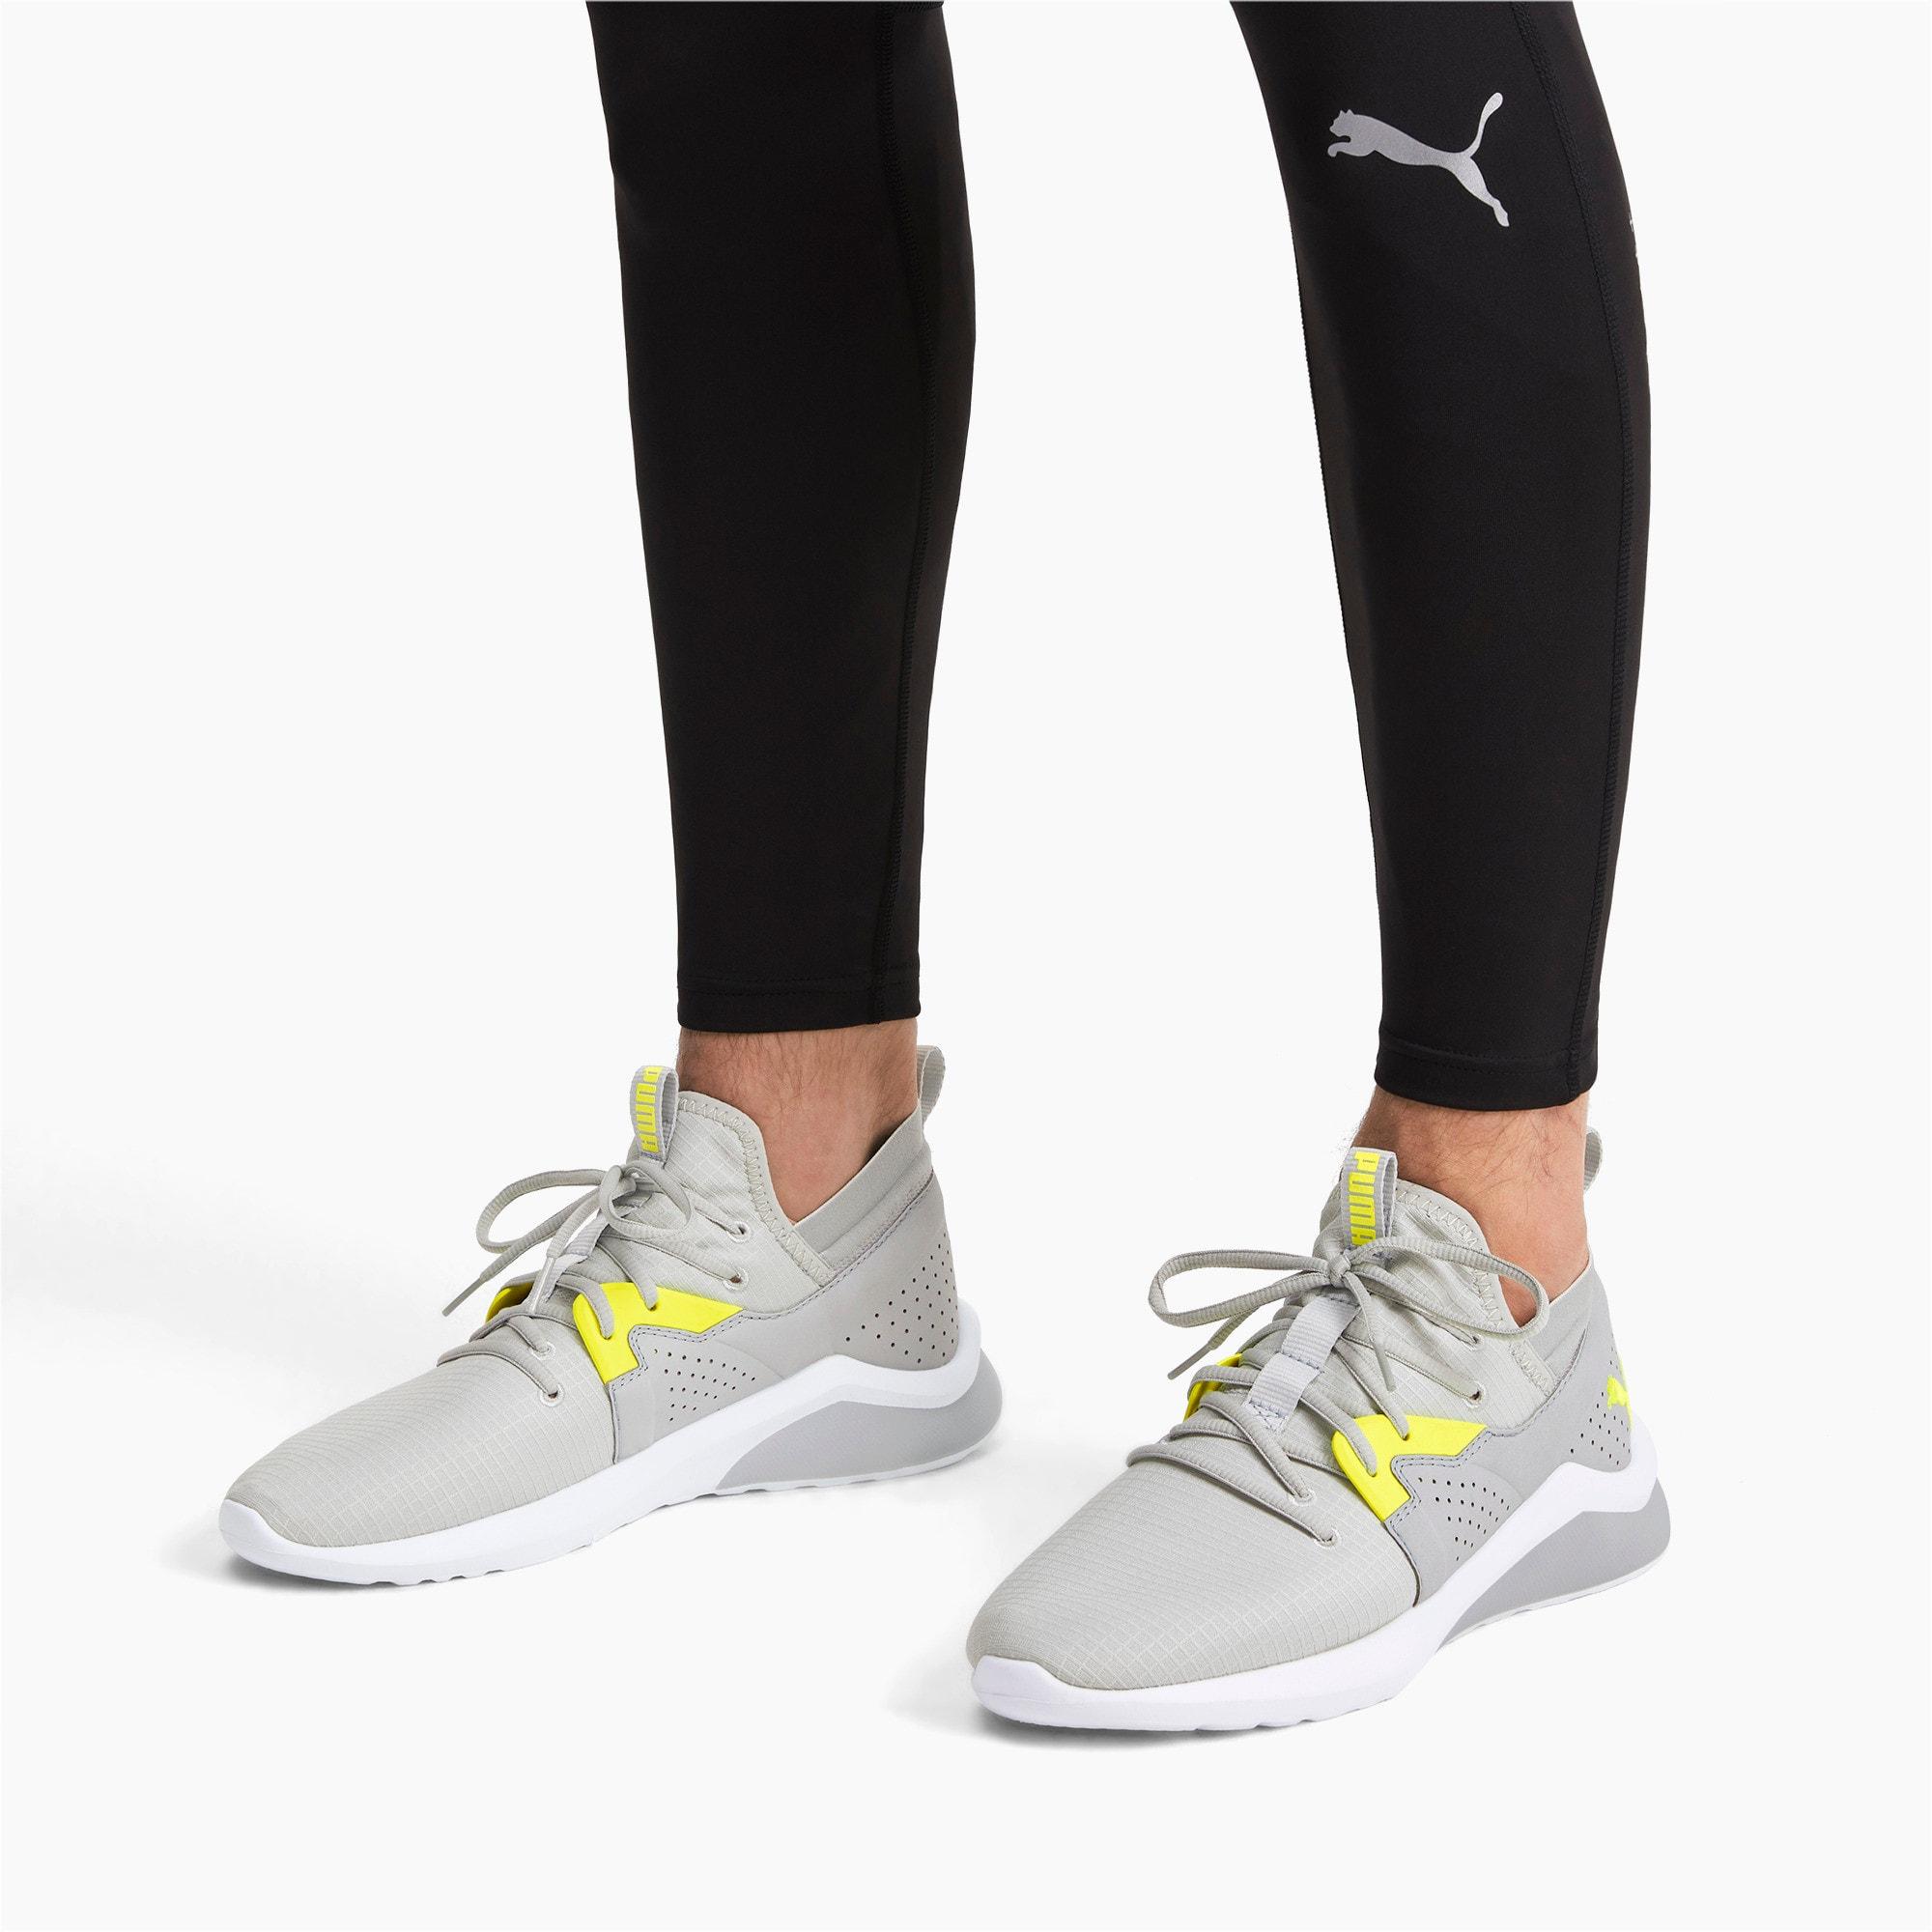 Thumbnail 3 of Emergence Lights Men's Running Shoes, High Rise-Yellow Alert, medium-IND